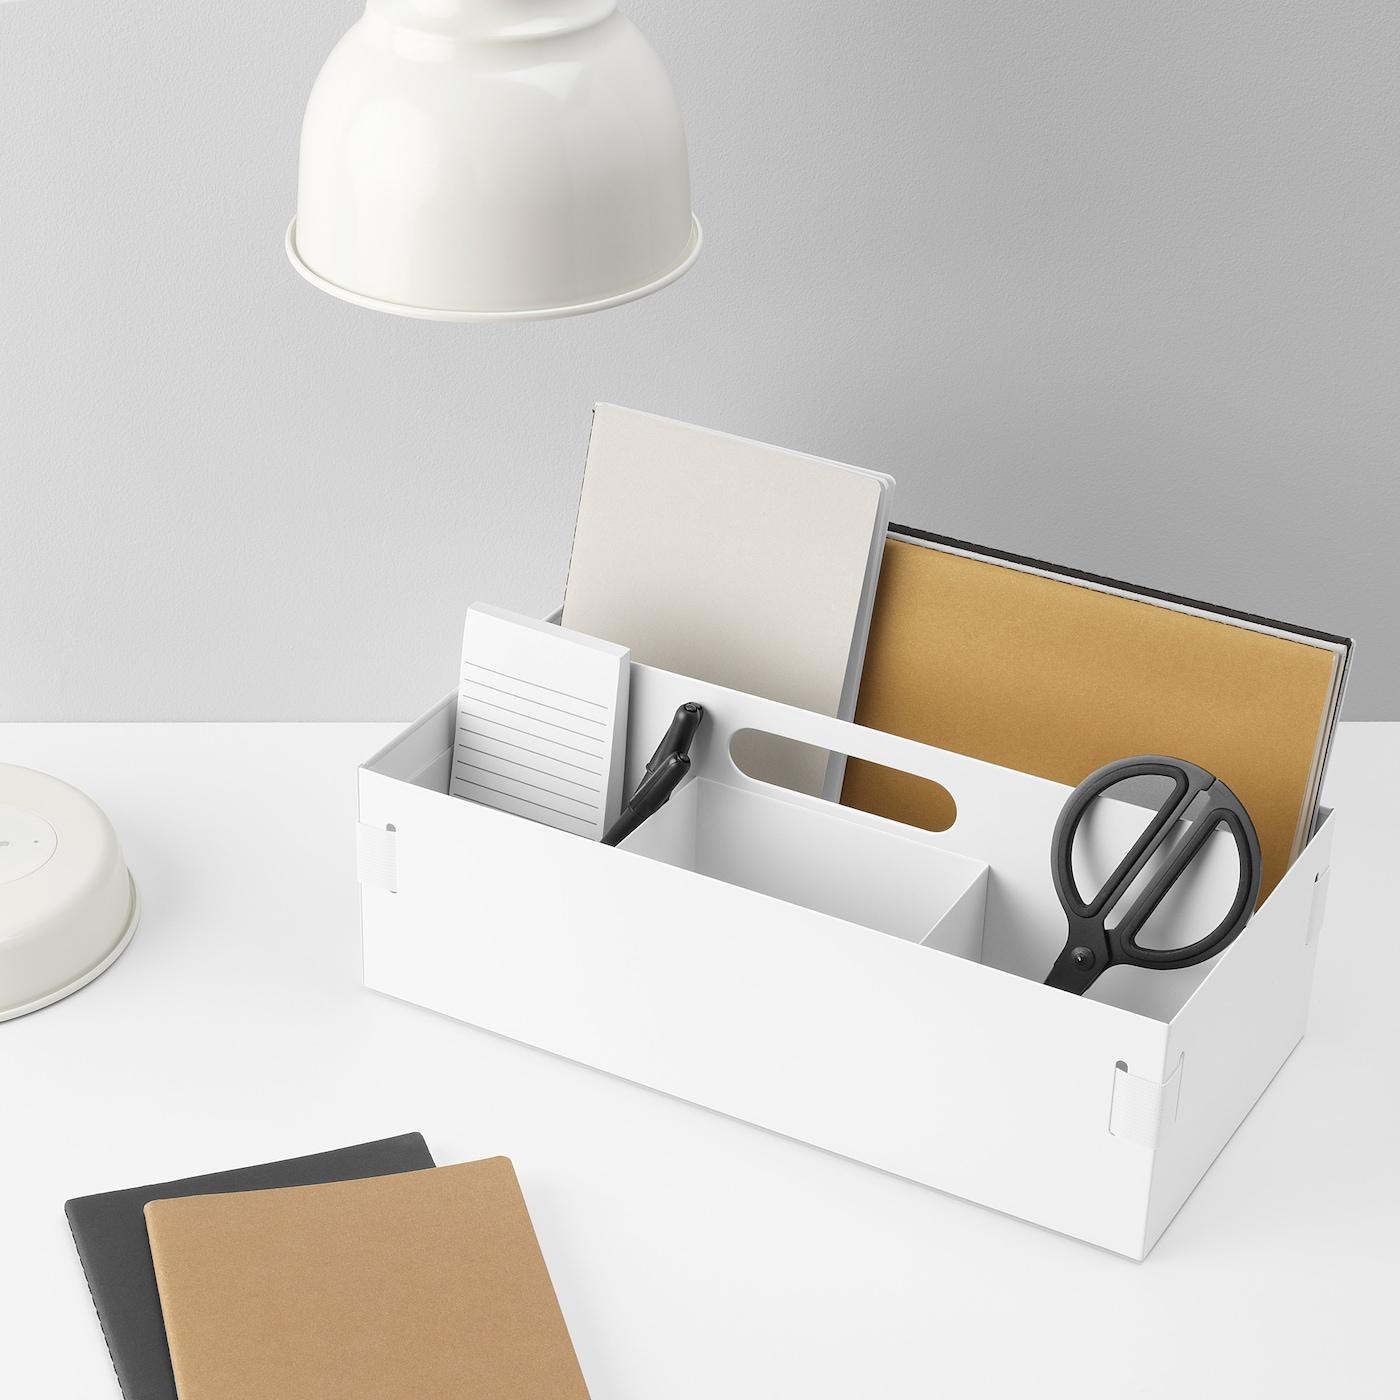 "KVISSLE Desk organizer 31x31 ¼x31 ½ """